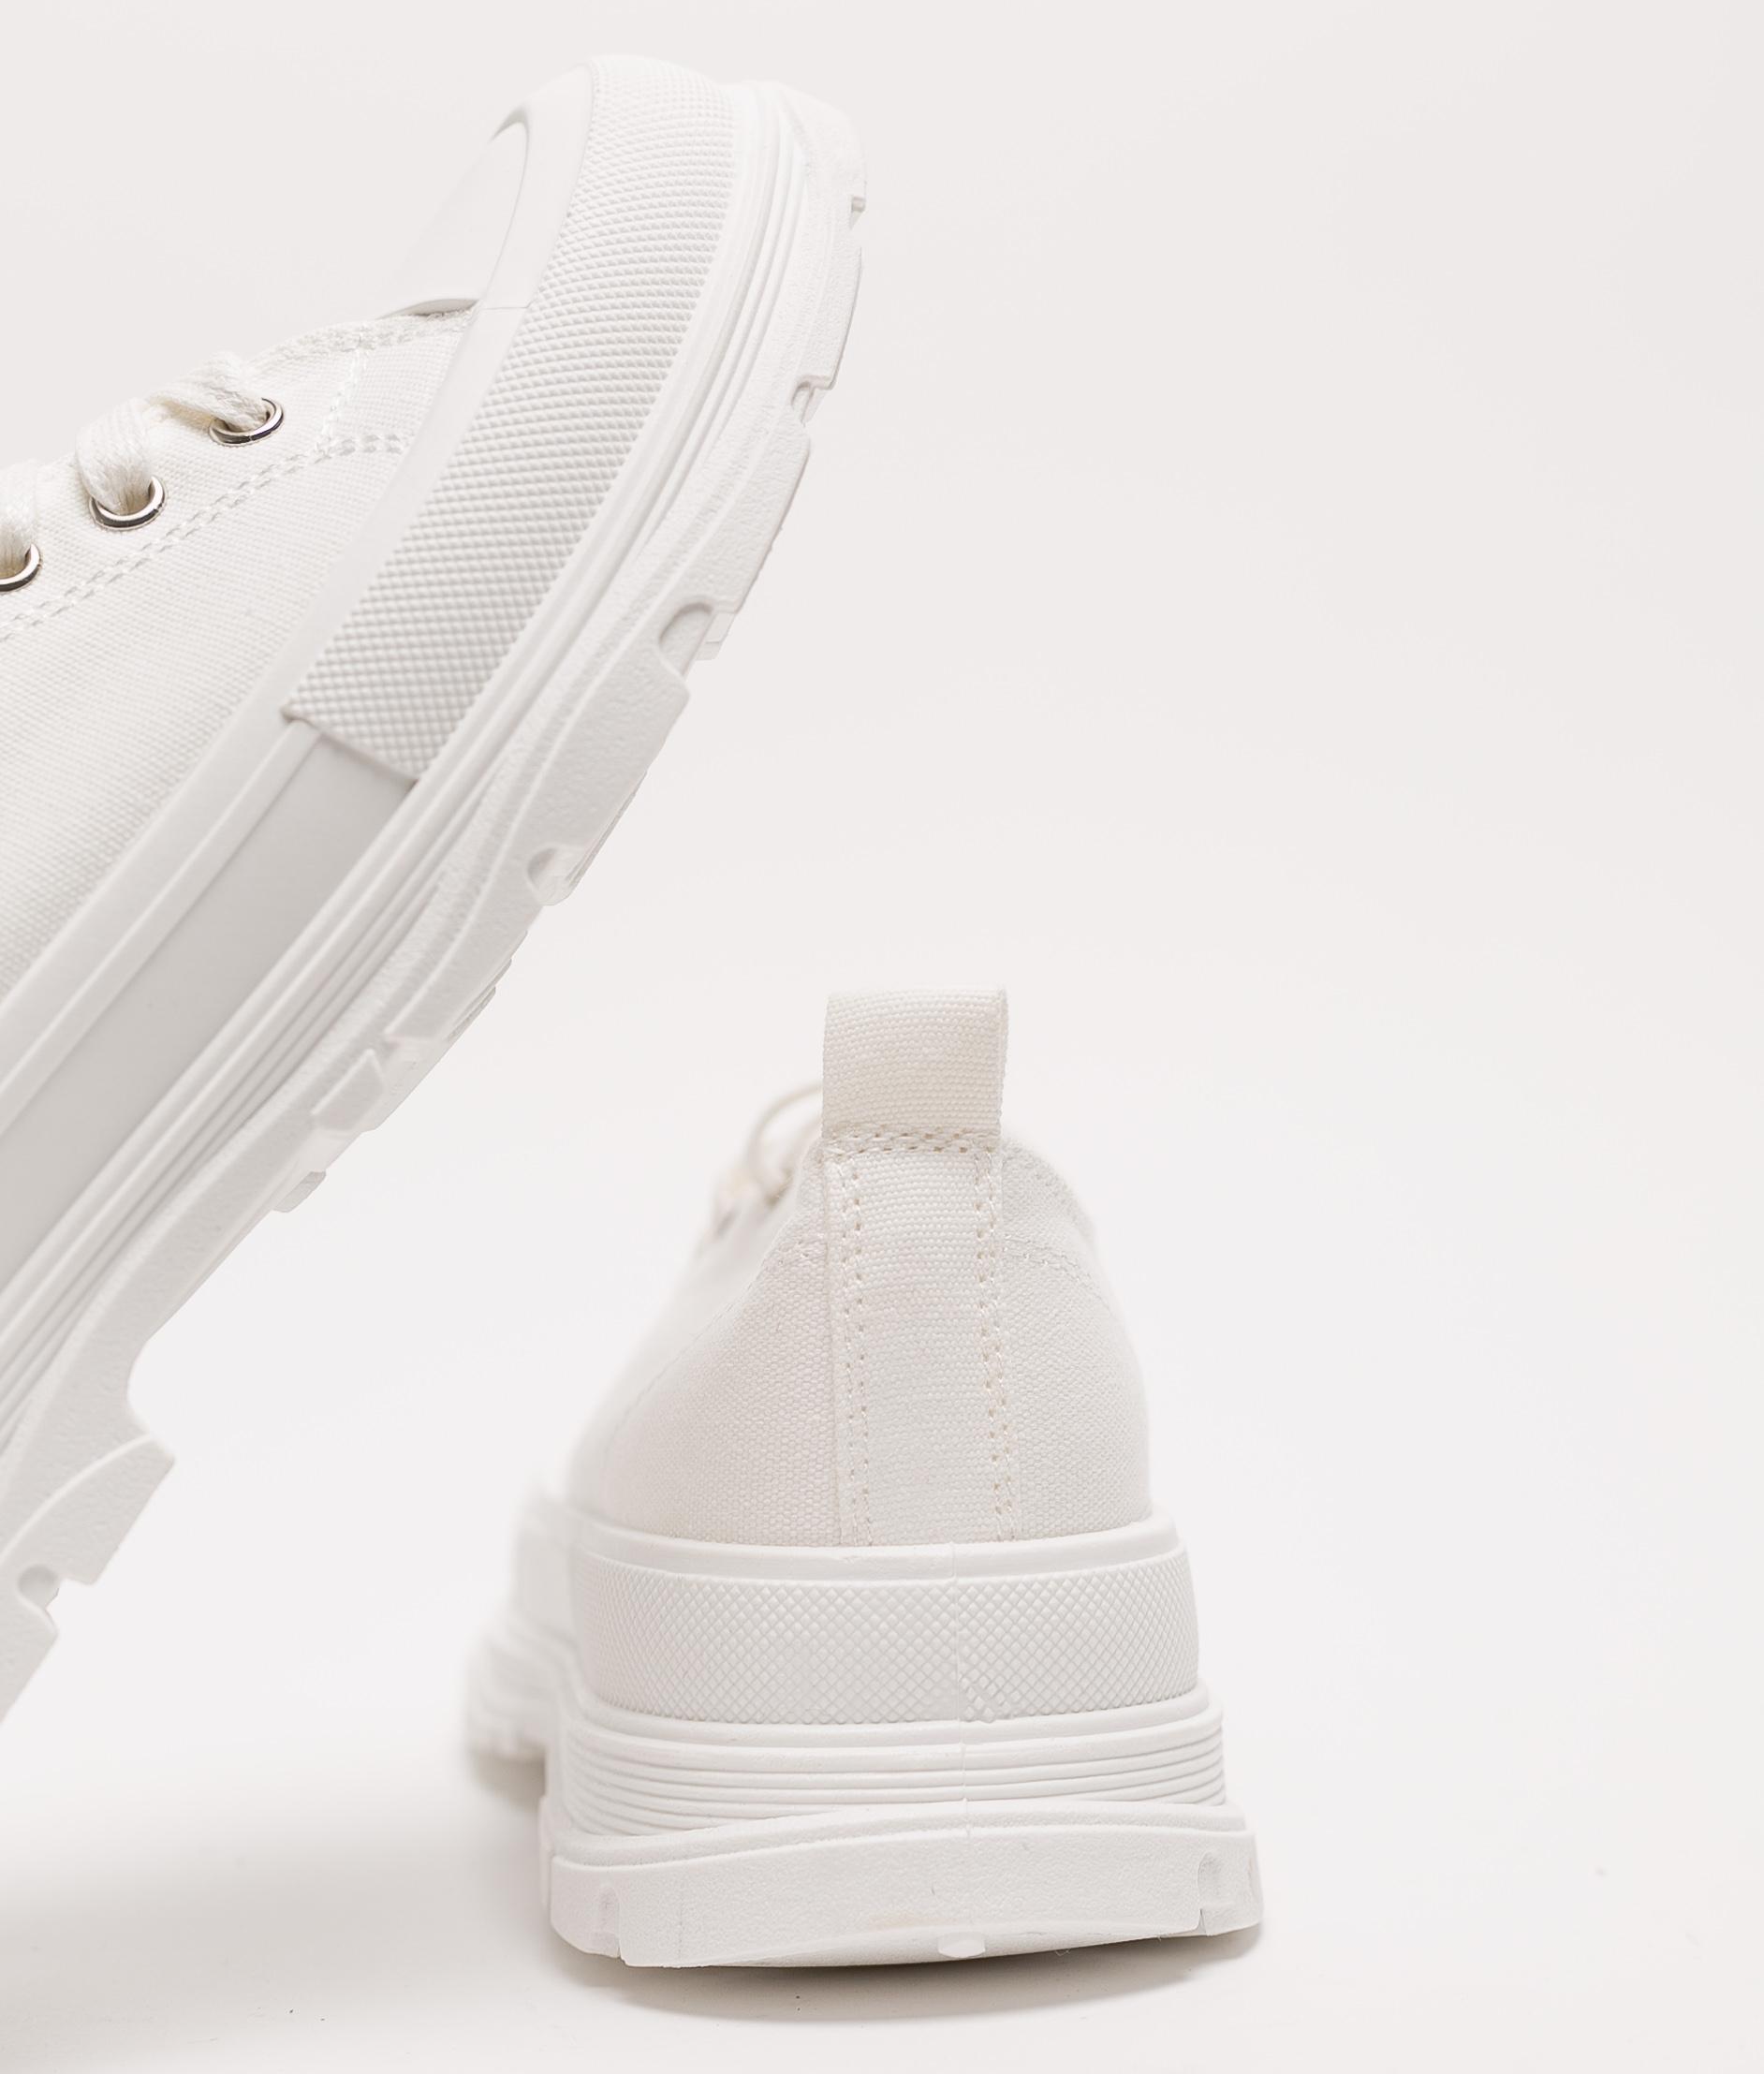 Sneakers Kele - Branco